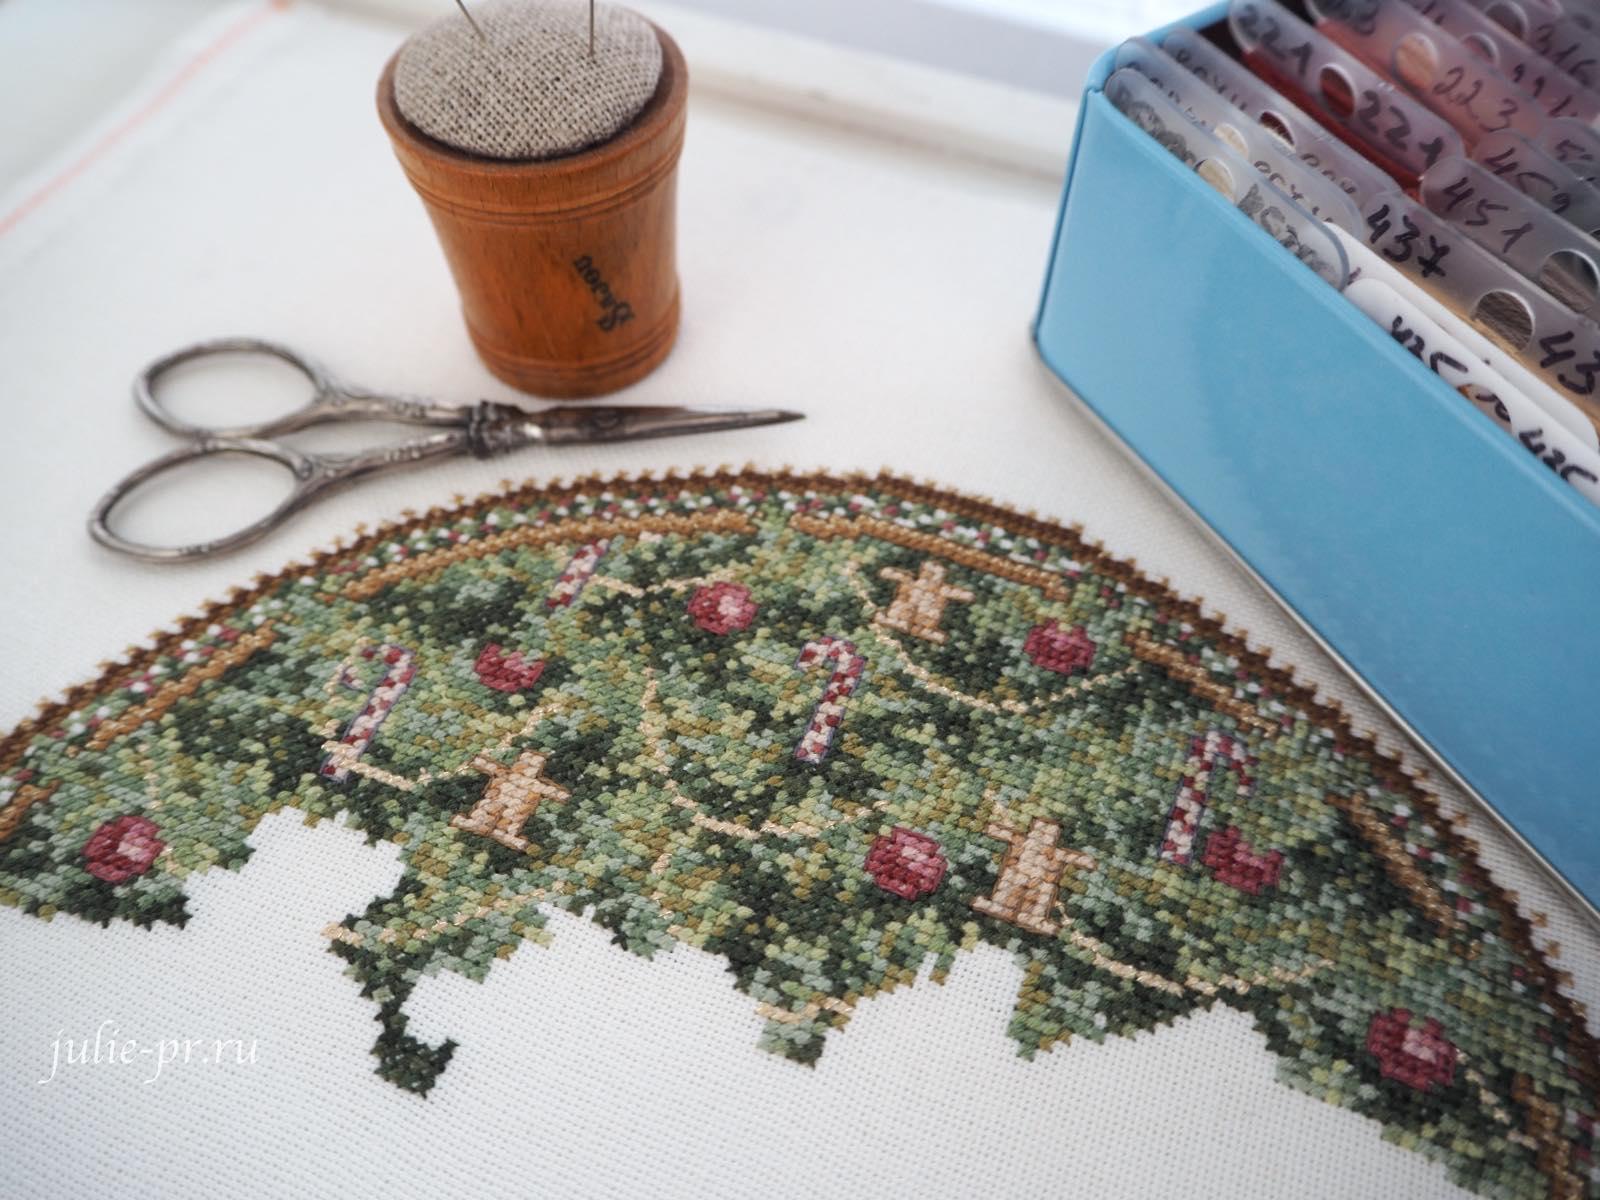 Teresa Wentzler - Under the Evergreen, вышивка крестом, тереза Венцлер, под елкой, елка